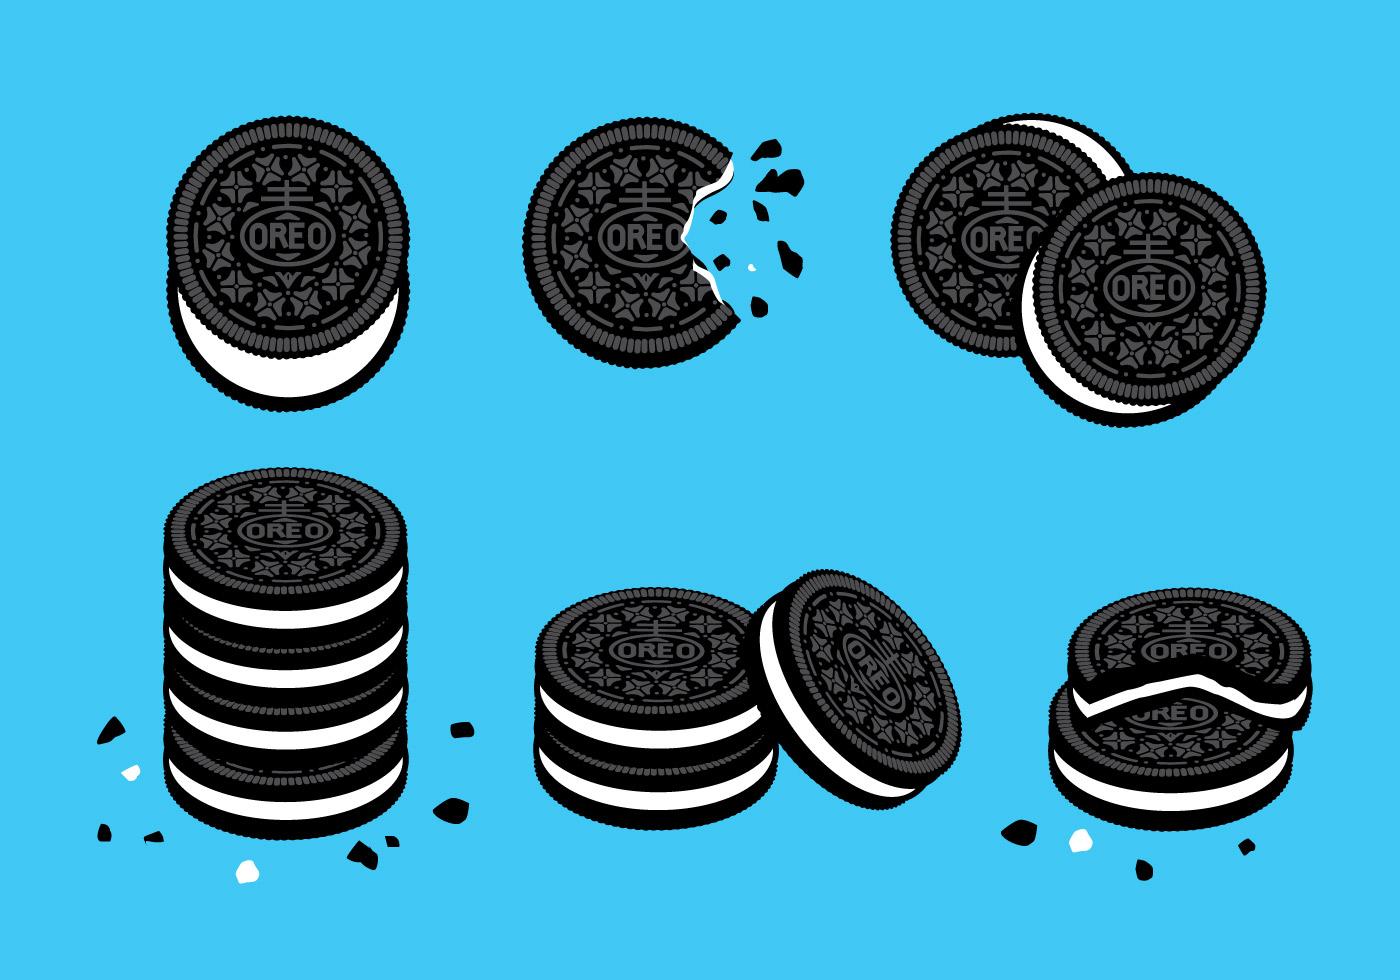 Black Wallpaper Border Oreo Cookies Vector Download Free Vector Art Stock